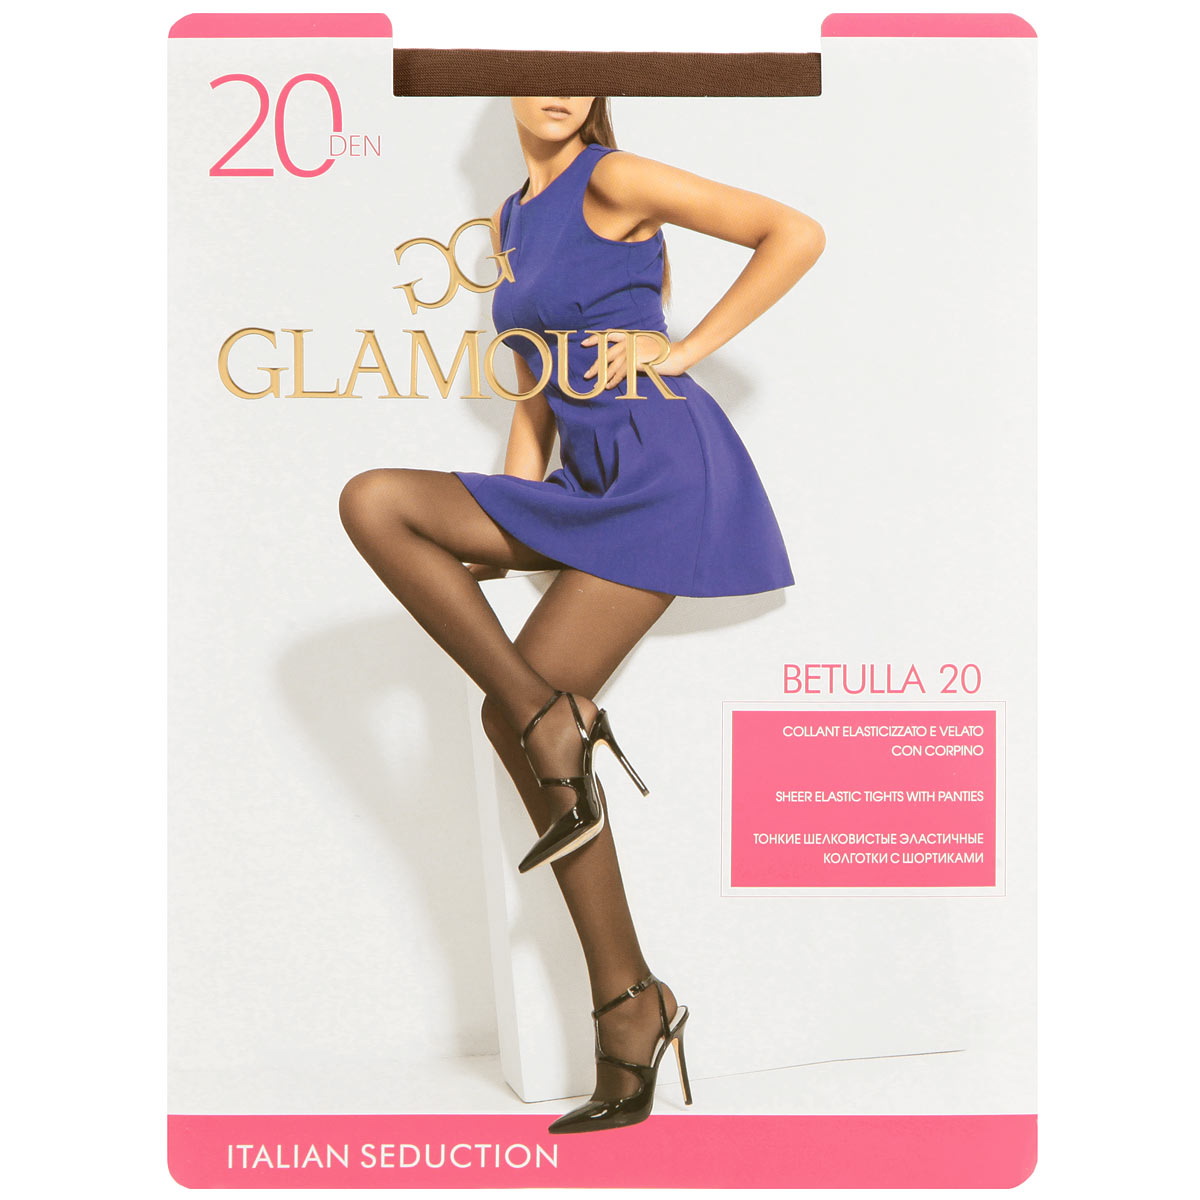 Колготки женские Glamour Betulla 20, цвет: Daino (загар). Размер 4 (L) колготки giulia bikini размер 3 плотность 40 den daino